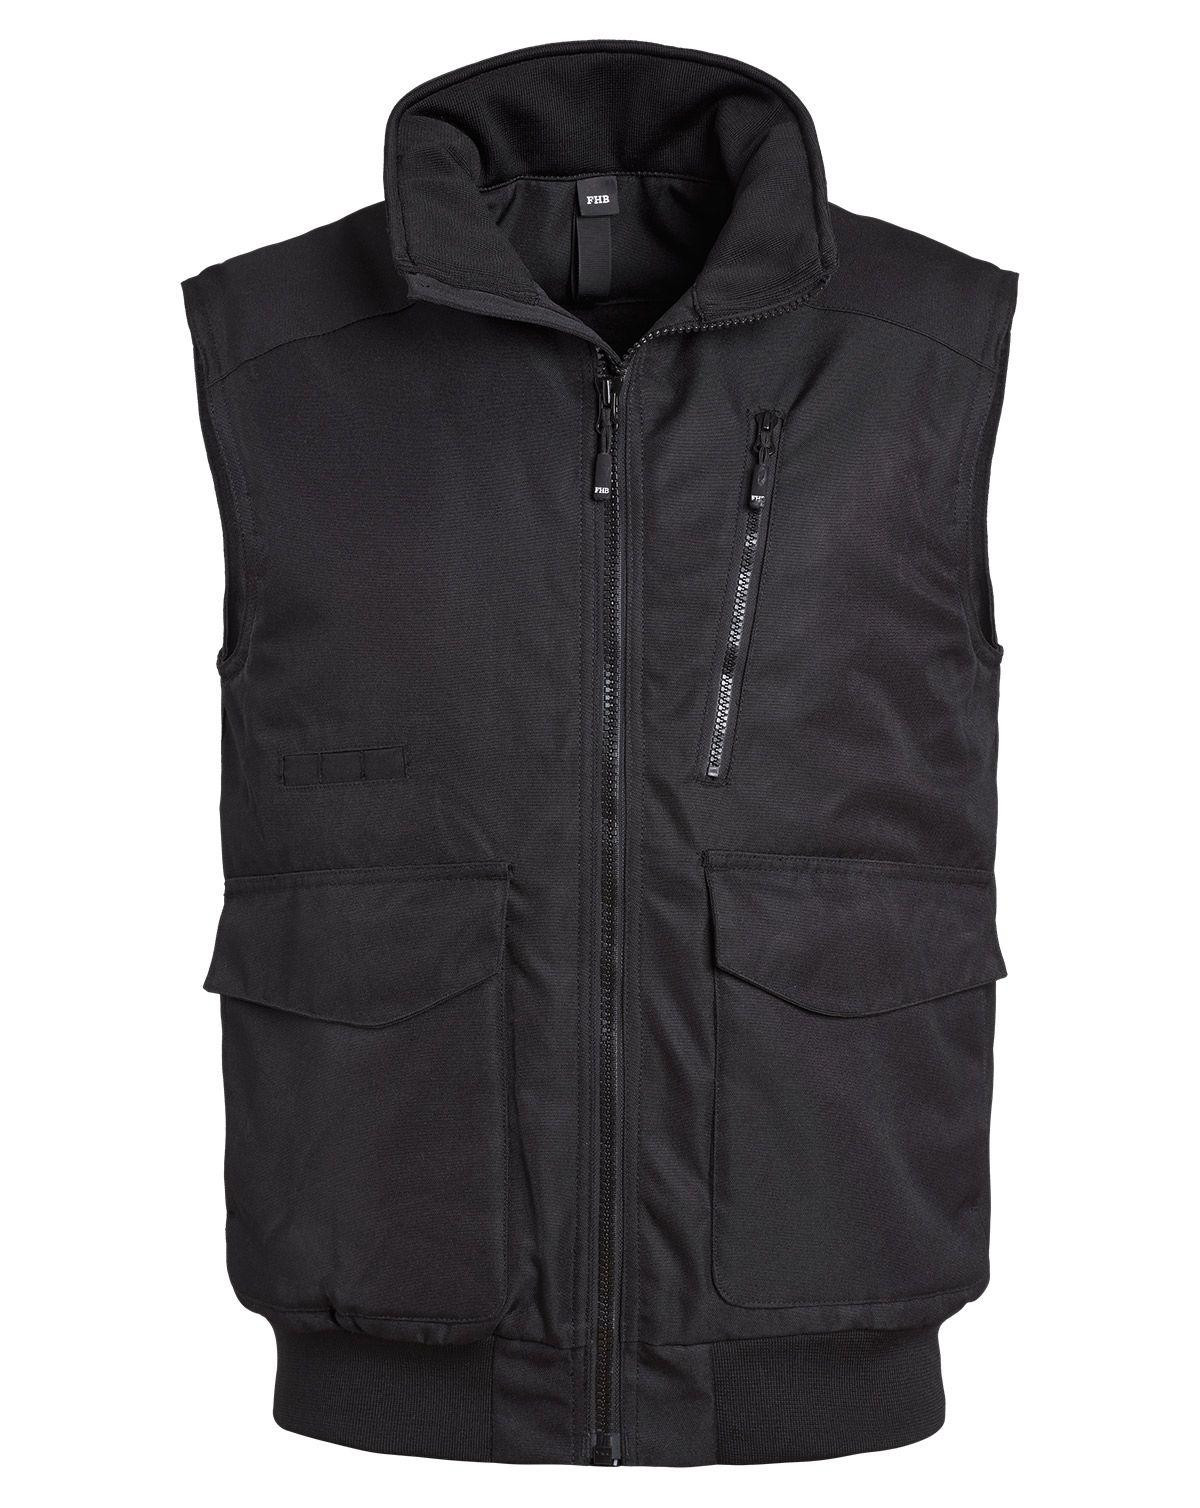 Image of   FHB Vest - Guido (Sort, 2XL)